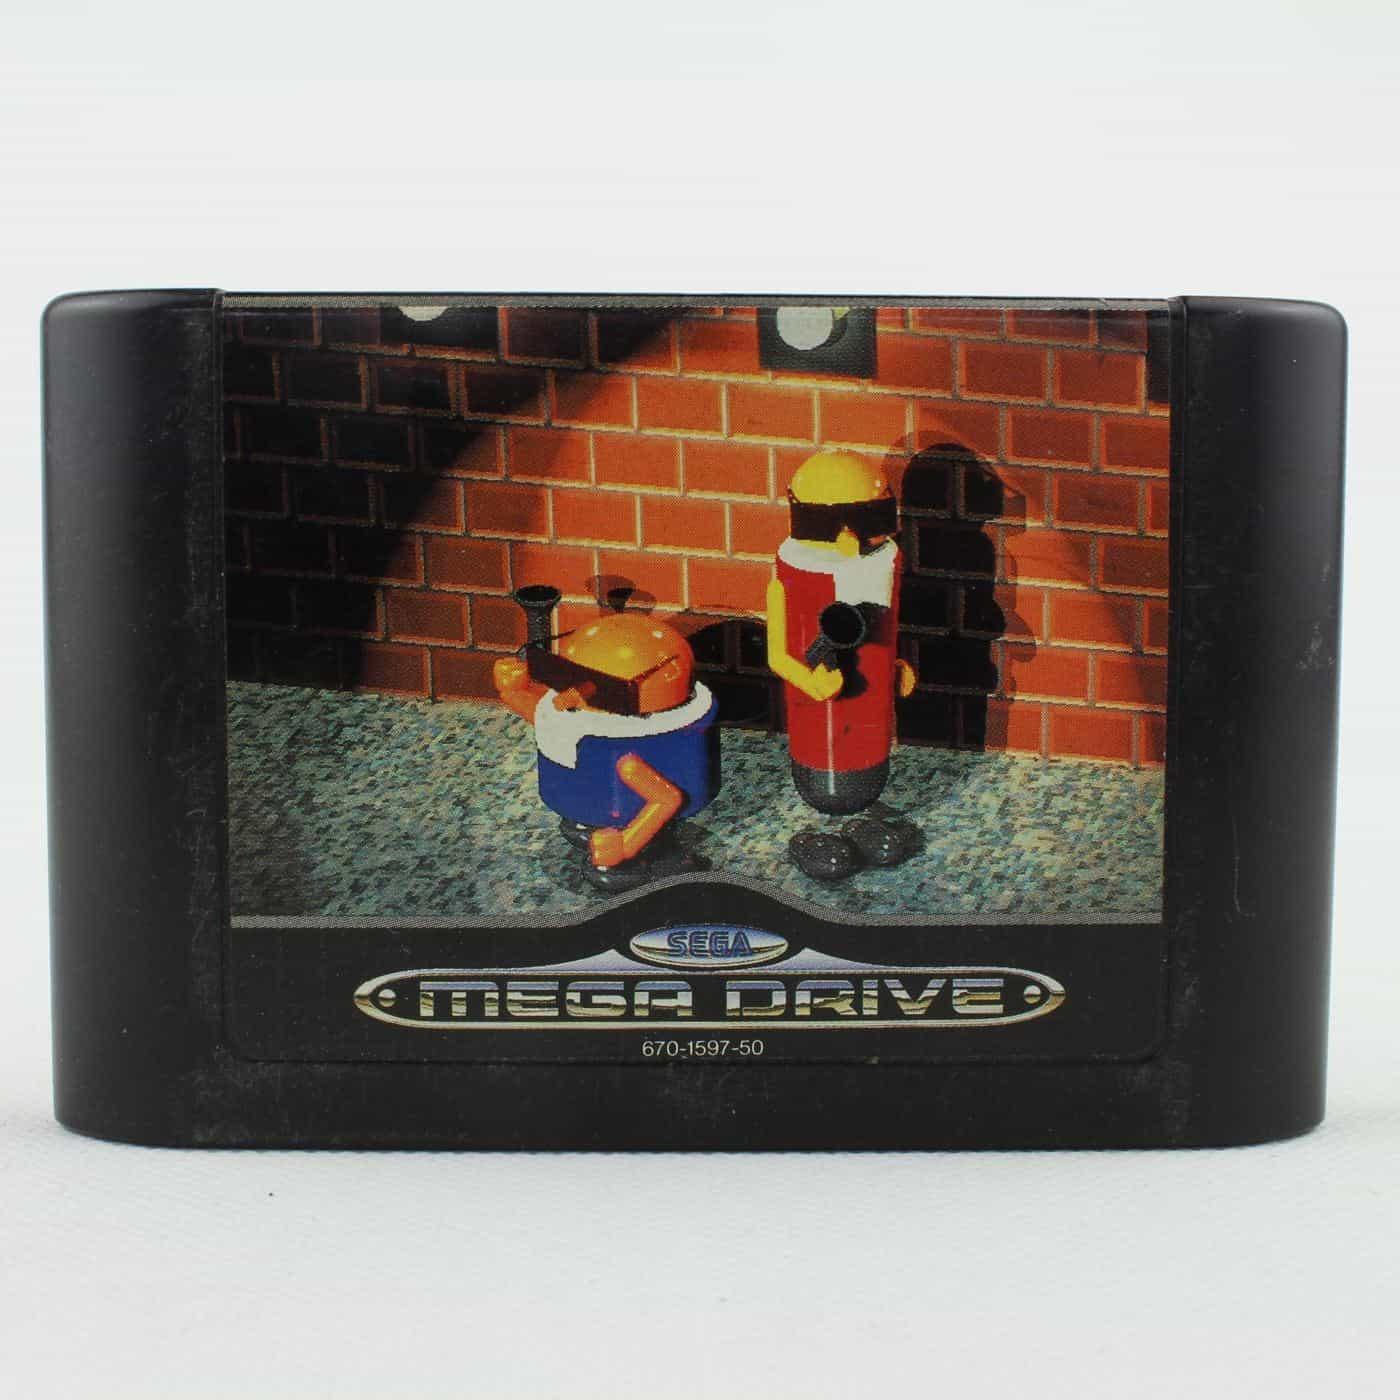 Bonanza Bros. (SEGA Mega Drive - Cartridge)